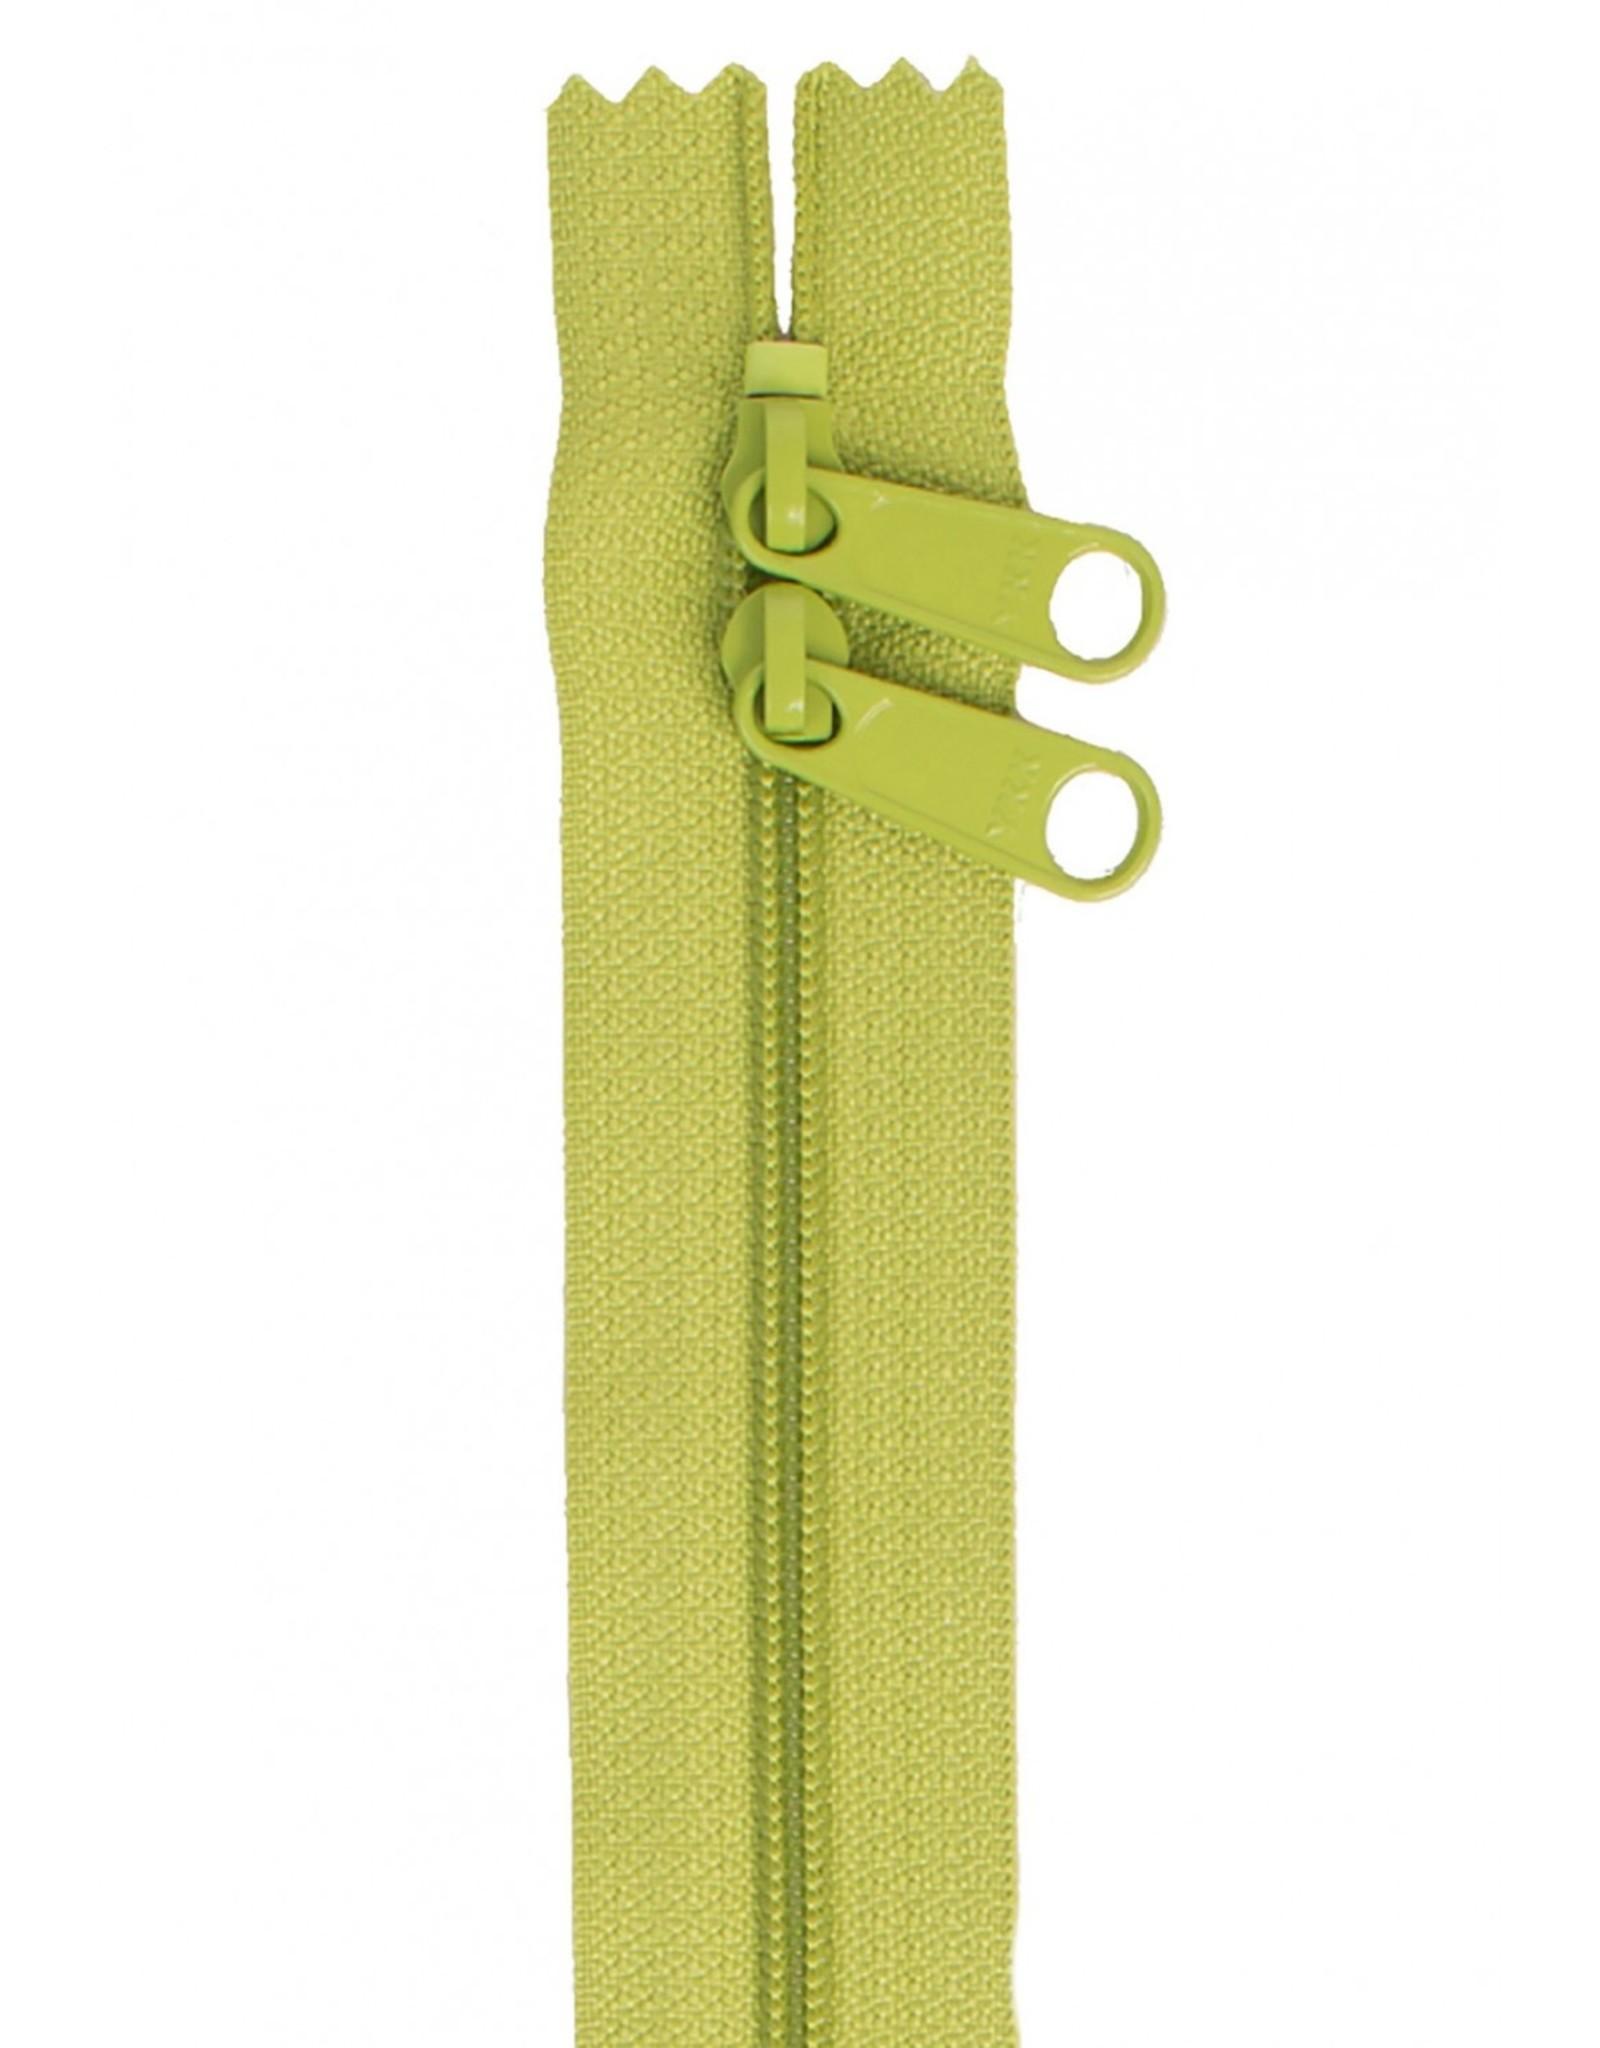 By Annie Handbag Zipper - 30 inch / 76 cm - double slide - Apple Green